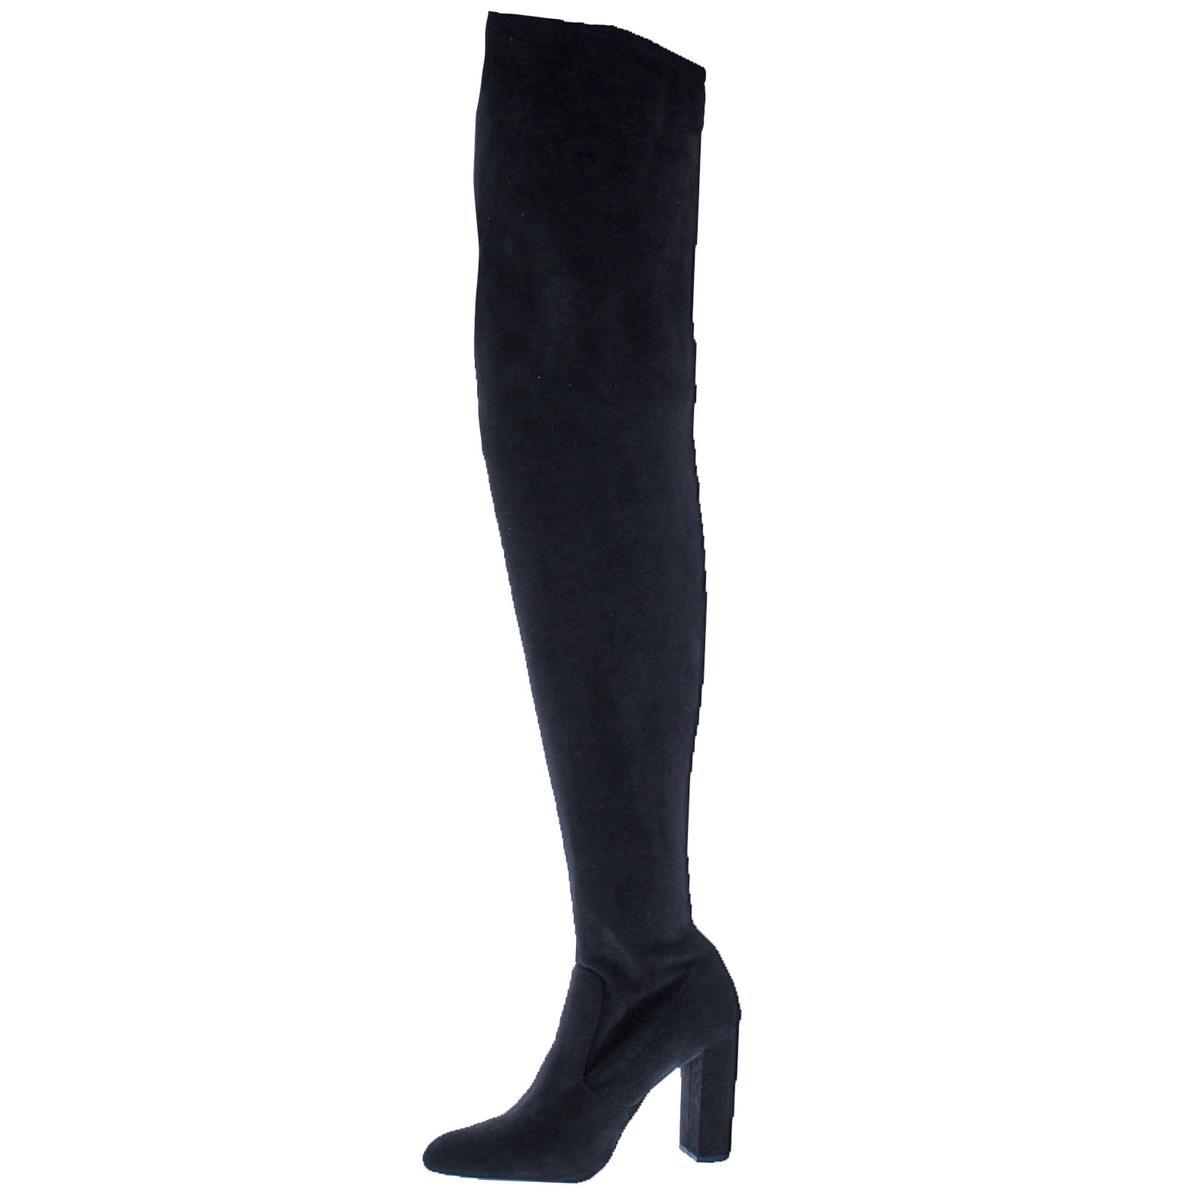 2ab653b22eb Steve Madden Womens Ezra Black Thigh-High Boots Shoes 7 Medium (B